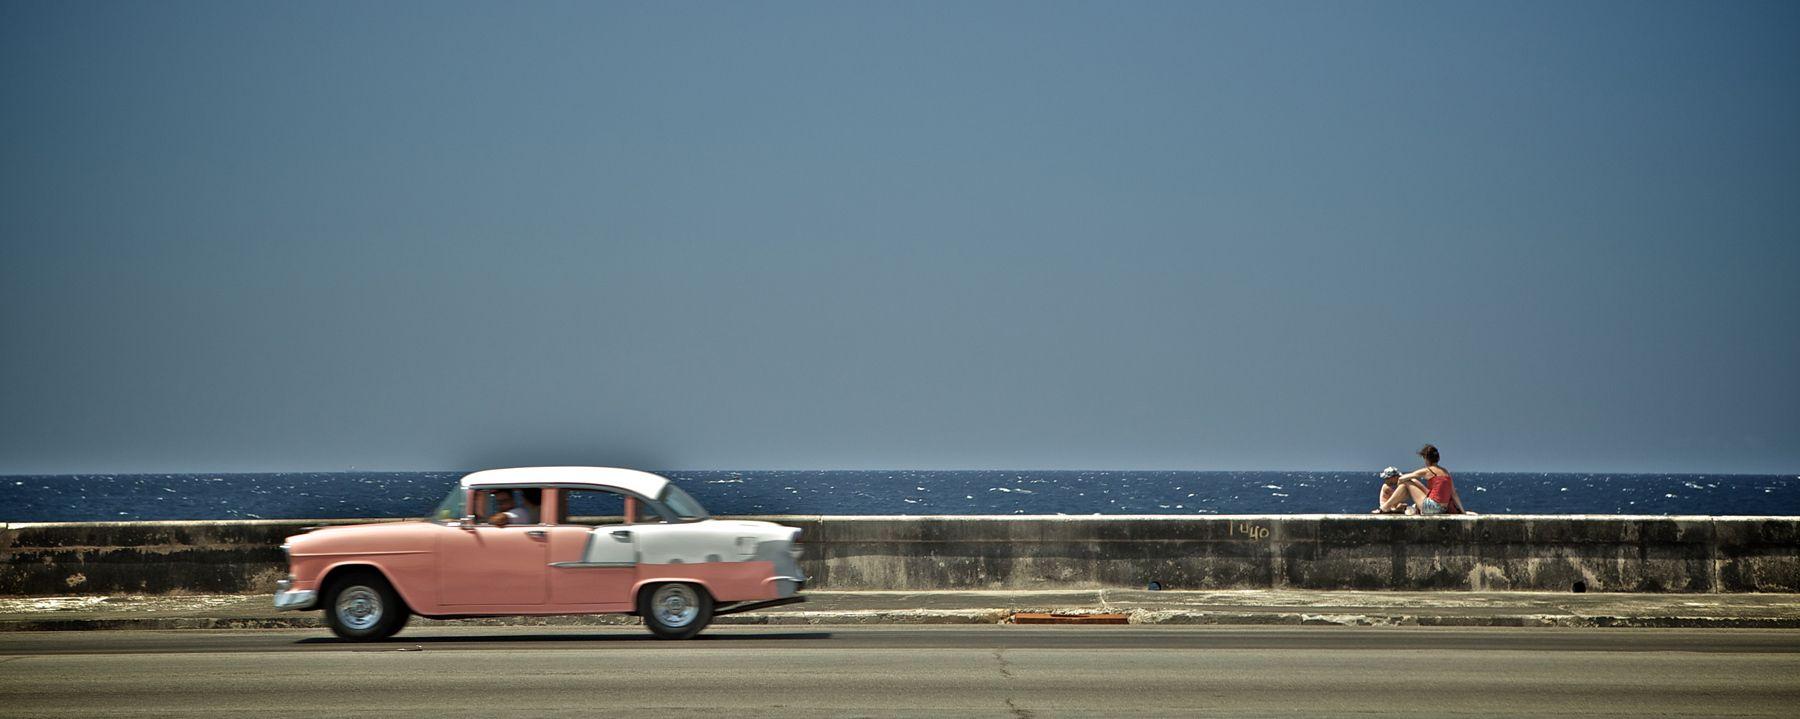 1pink_car__el_malecon__havana__cuba.jpg